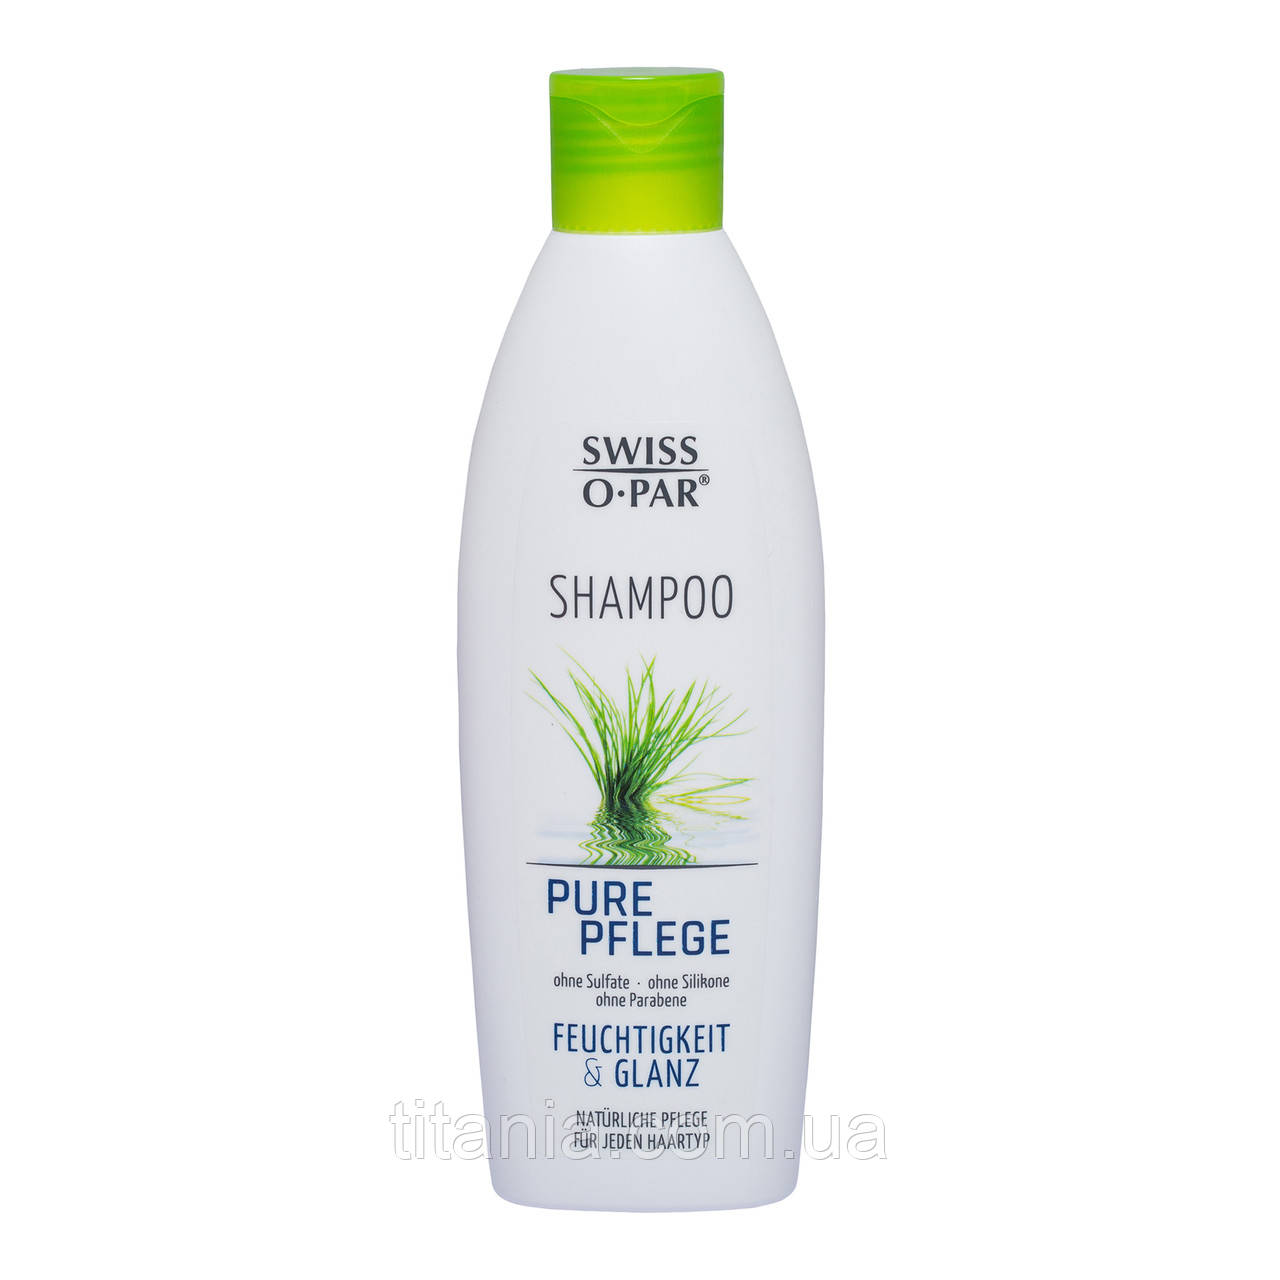 Шампунь для волосся Pure Pflege 250 мл SWISS-O-PAR 7230